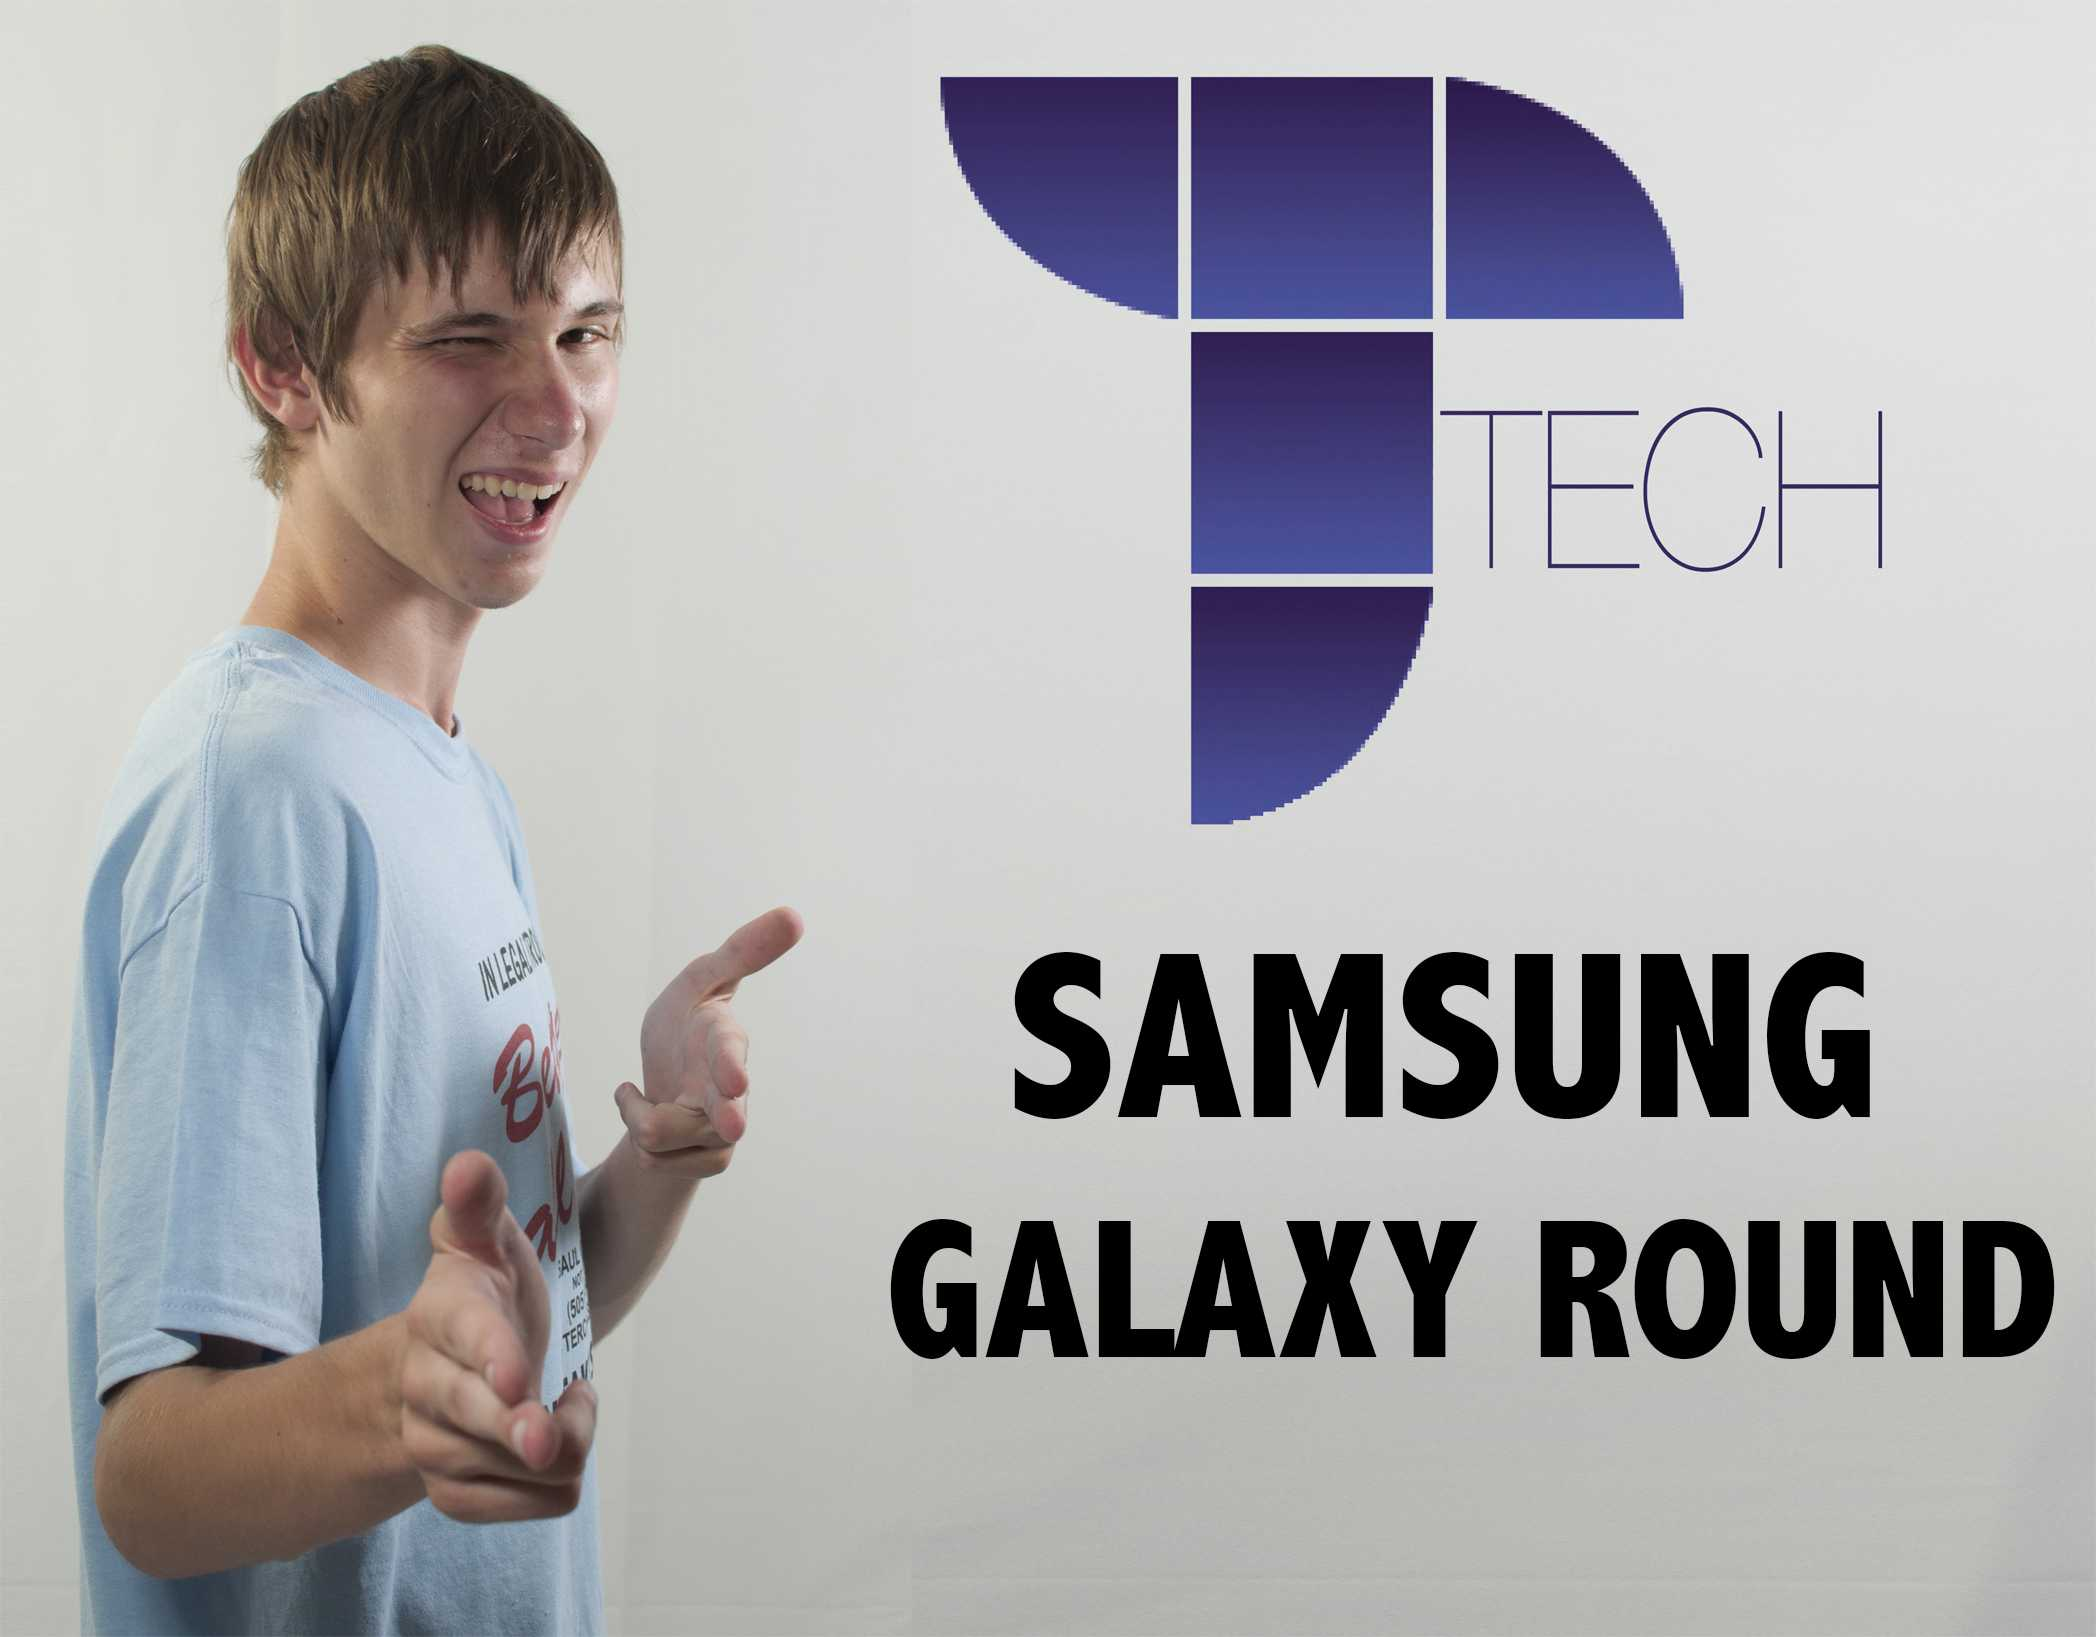 Today's Tech: Samsung Galaxy Round